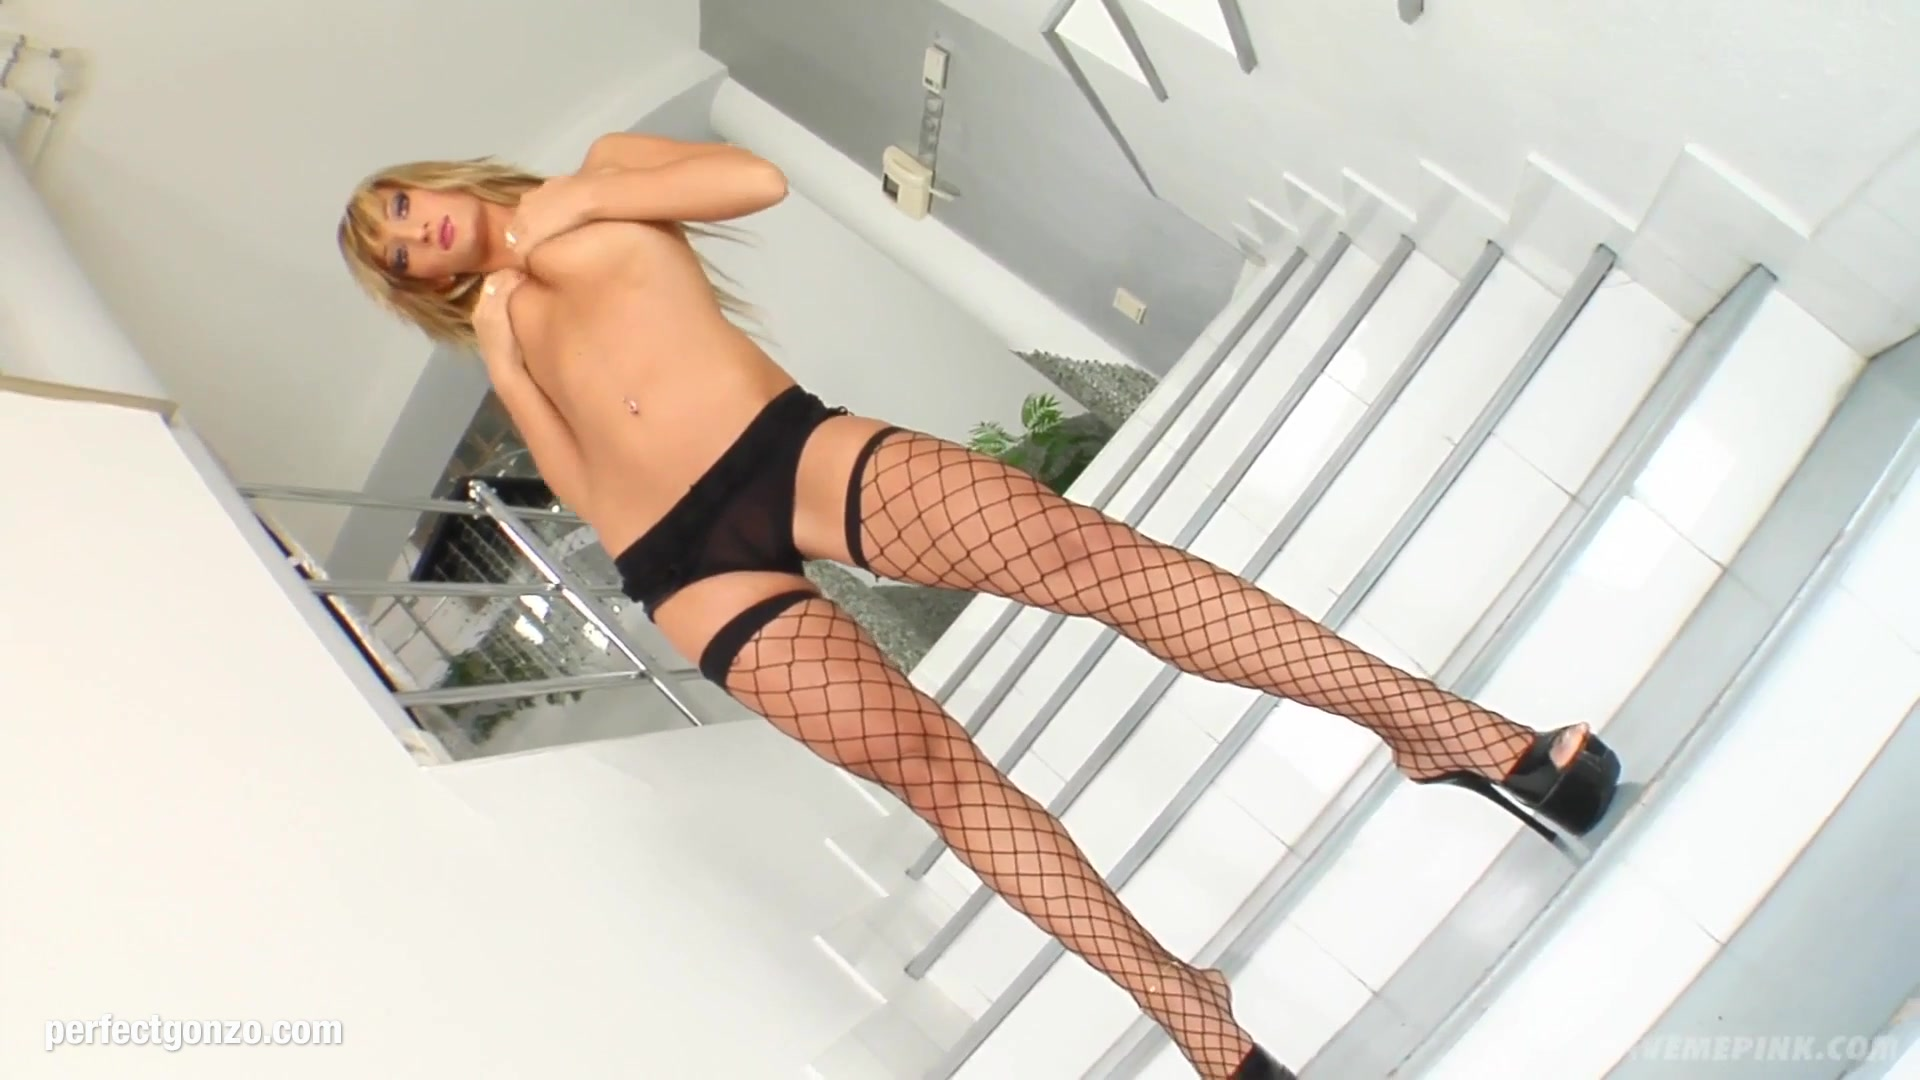 Naked FuckBook Fejvadaszok online dating